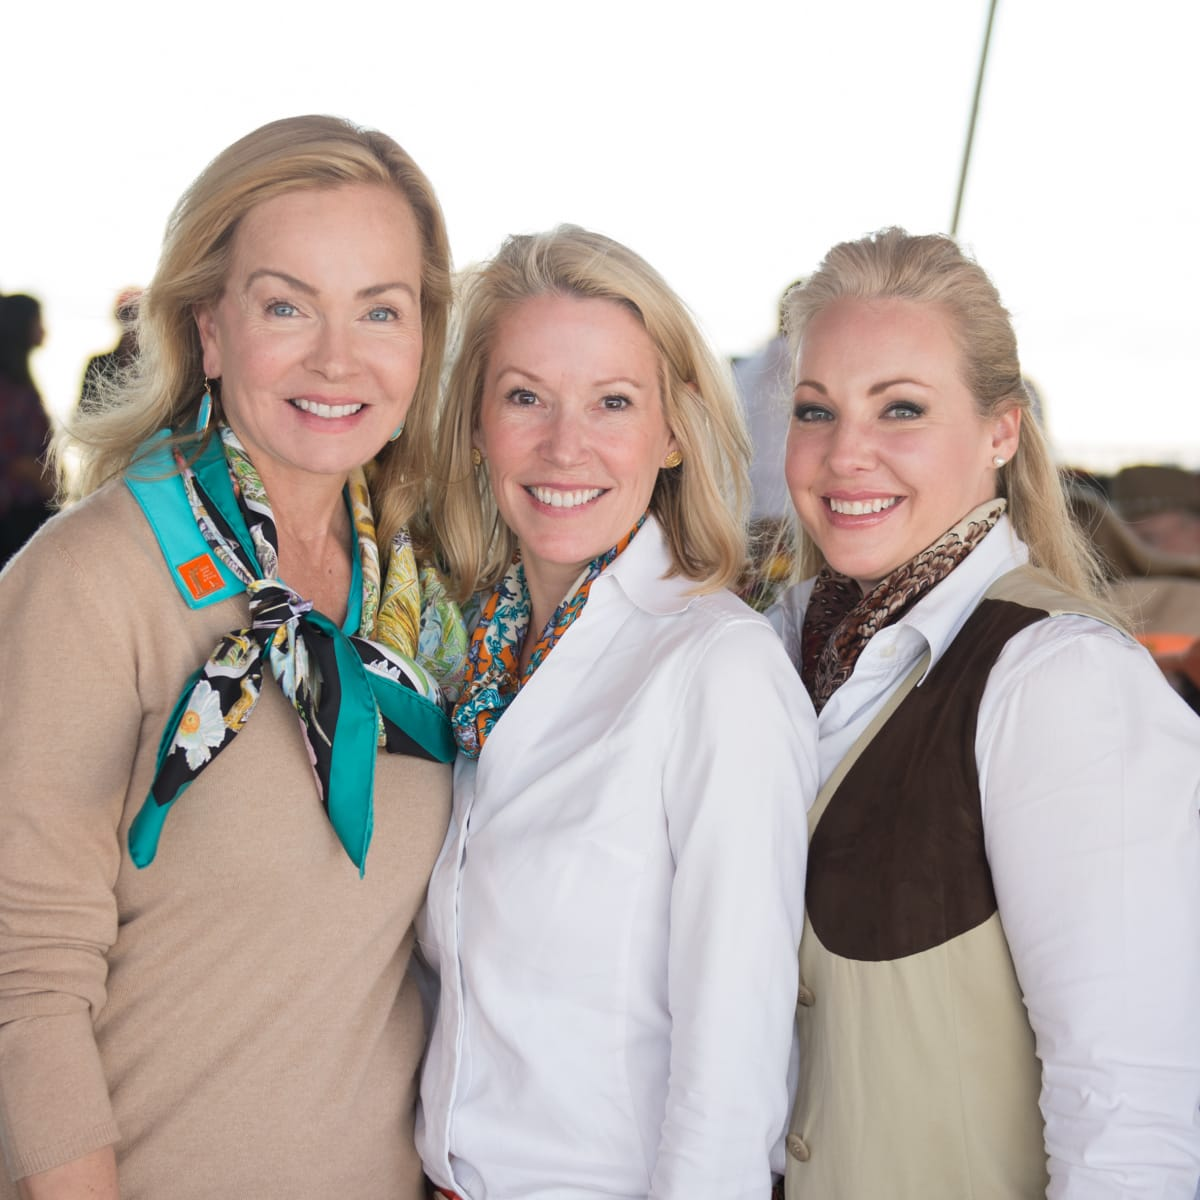 MFAH Fine Art of Shooting, March 2016, Alice Mosing; Claudia Oelman; Katherine Stacy